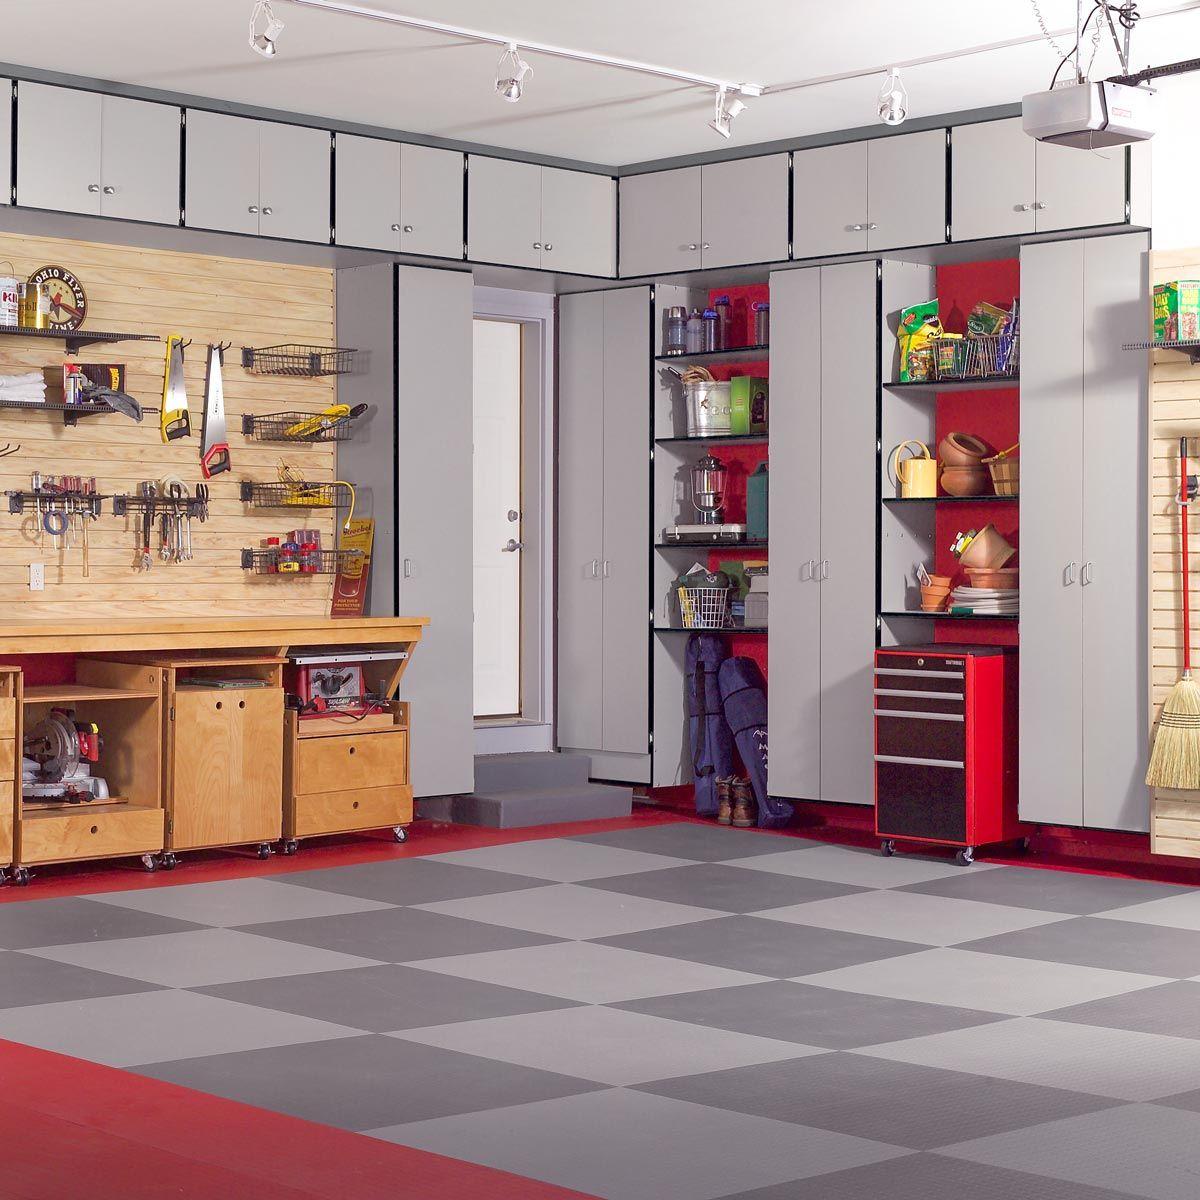 Diy wooden garage garage ultimate